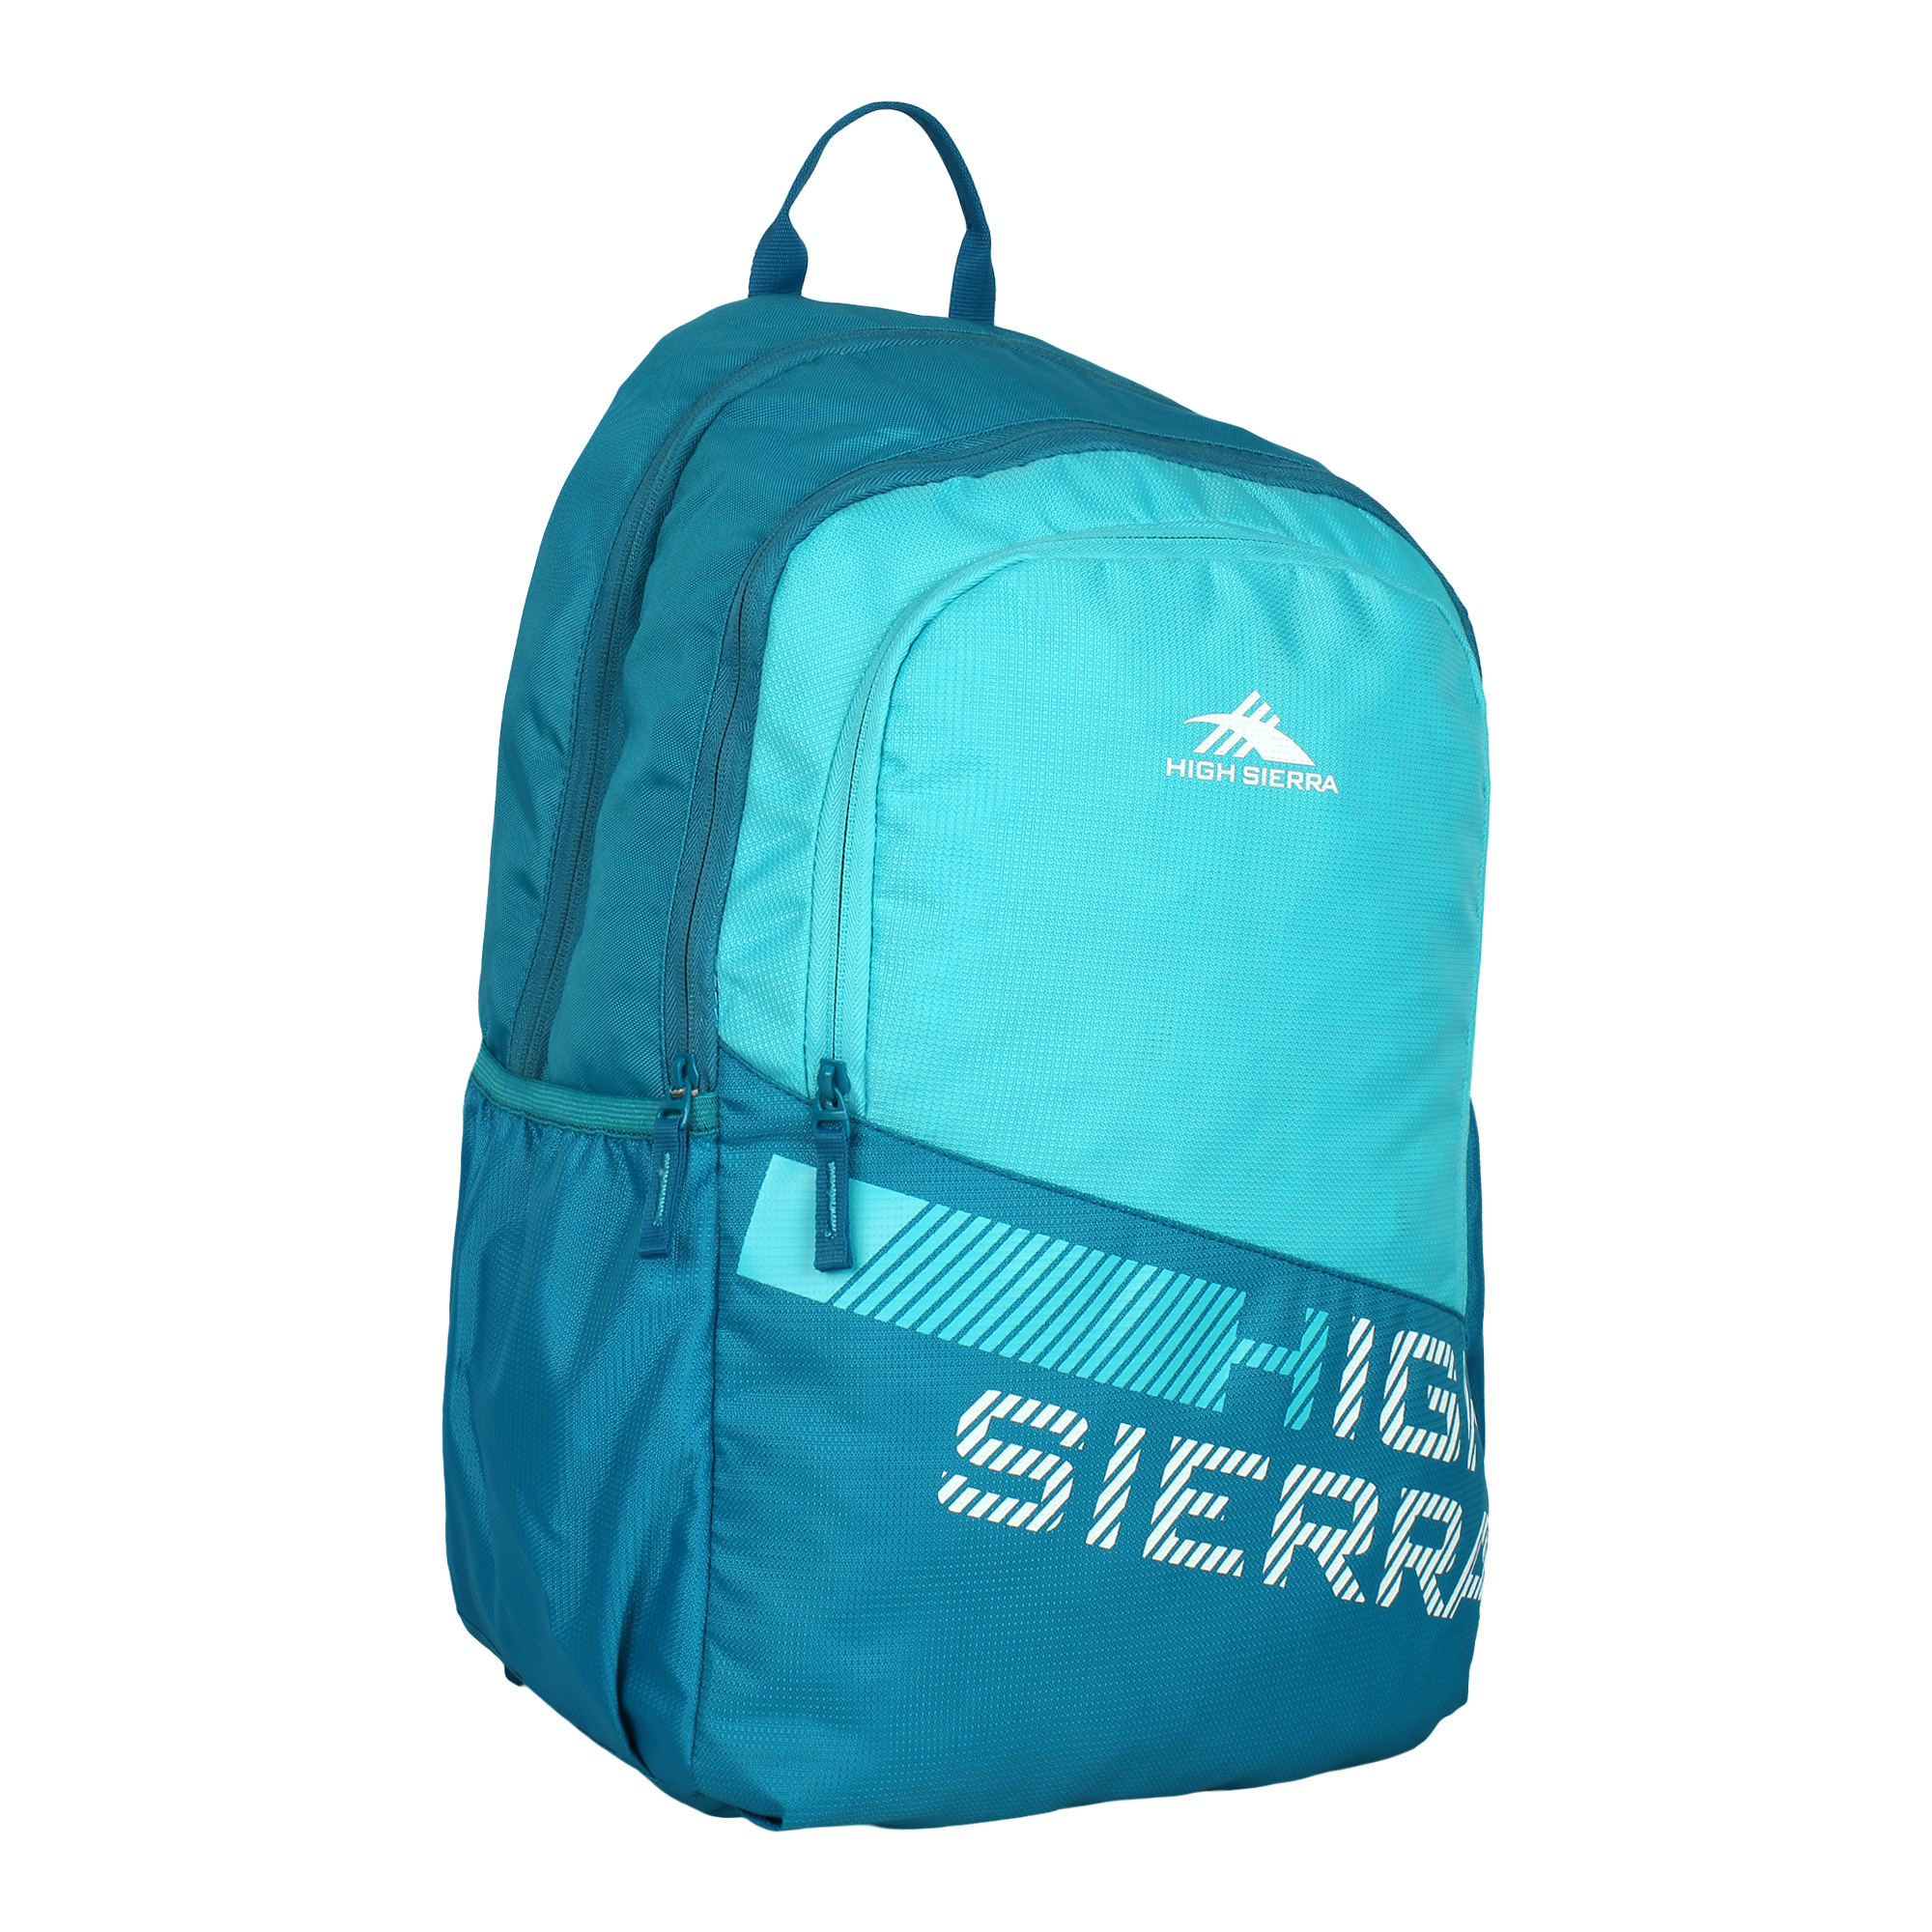 HIGH SIERRA BY AMERICAN TOURISTER RIDGE 02